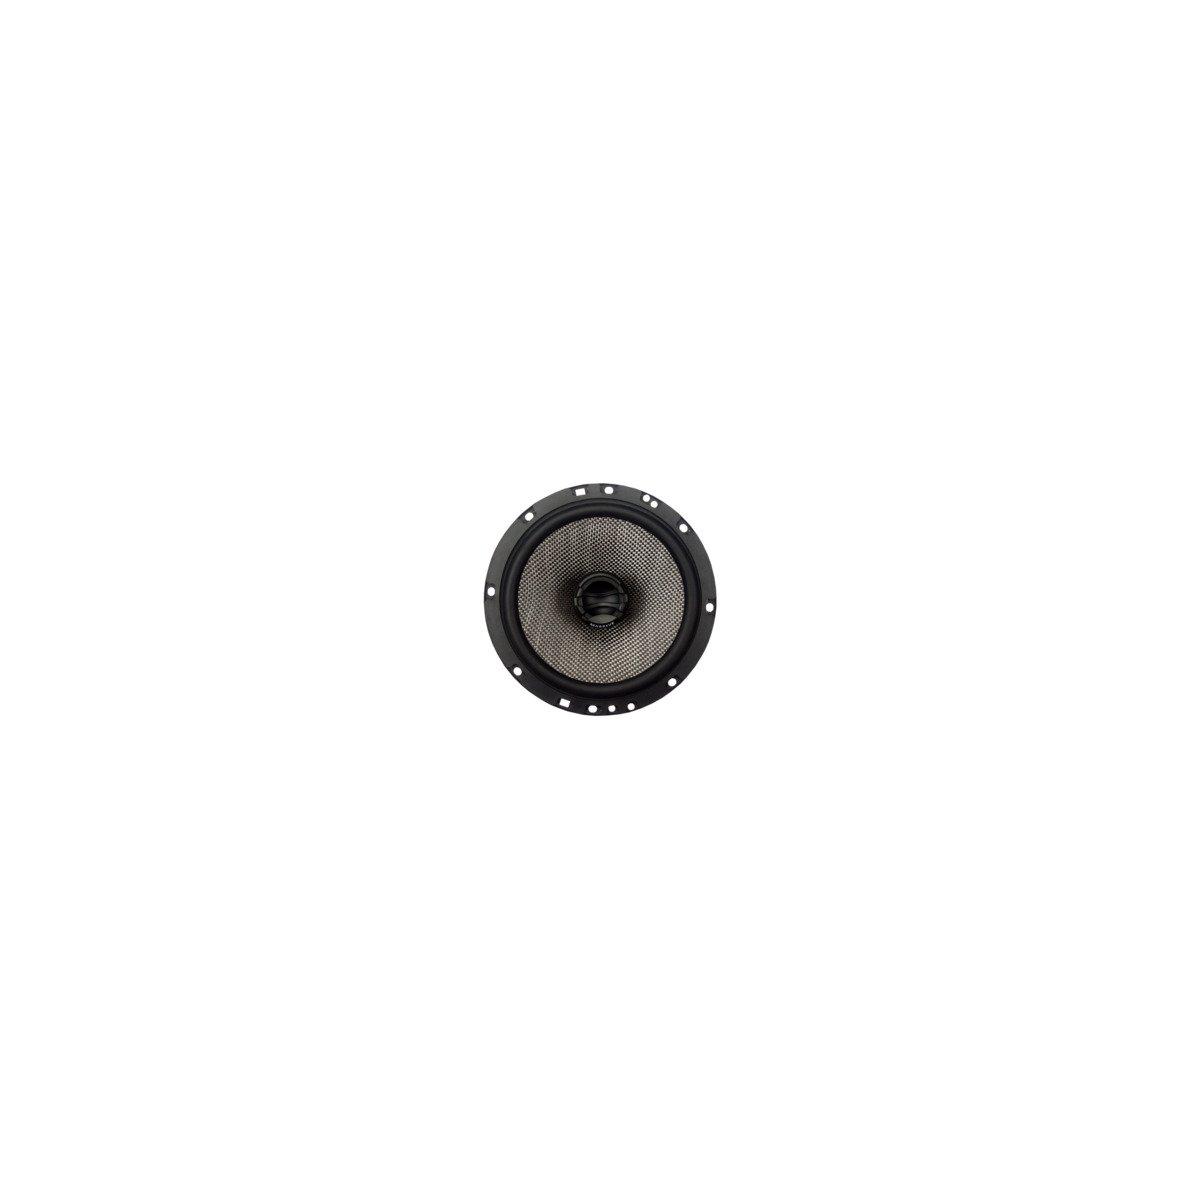 "Massive Audio FX6 6.5"" Speaker -"